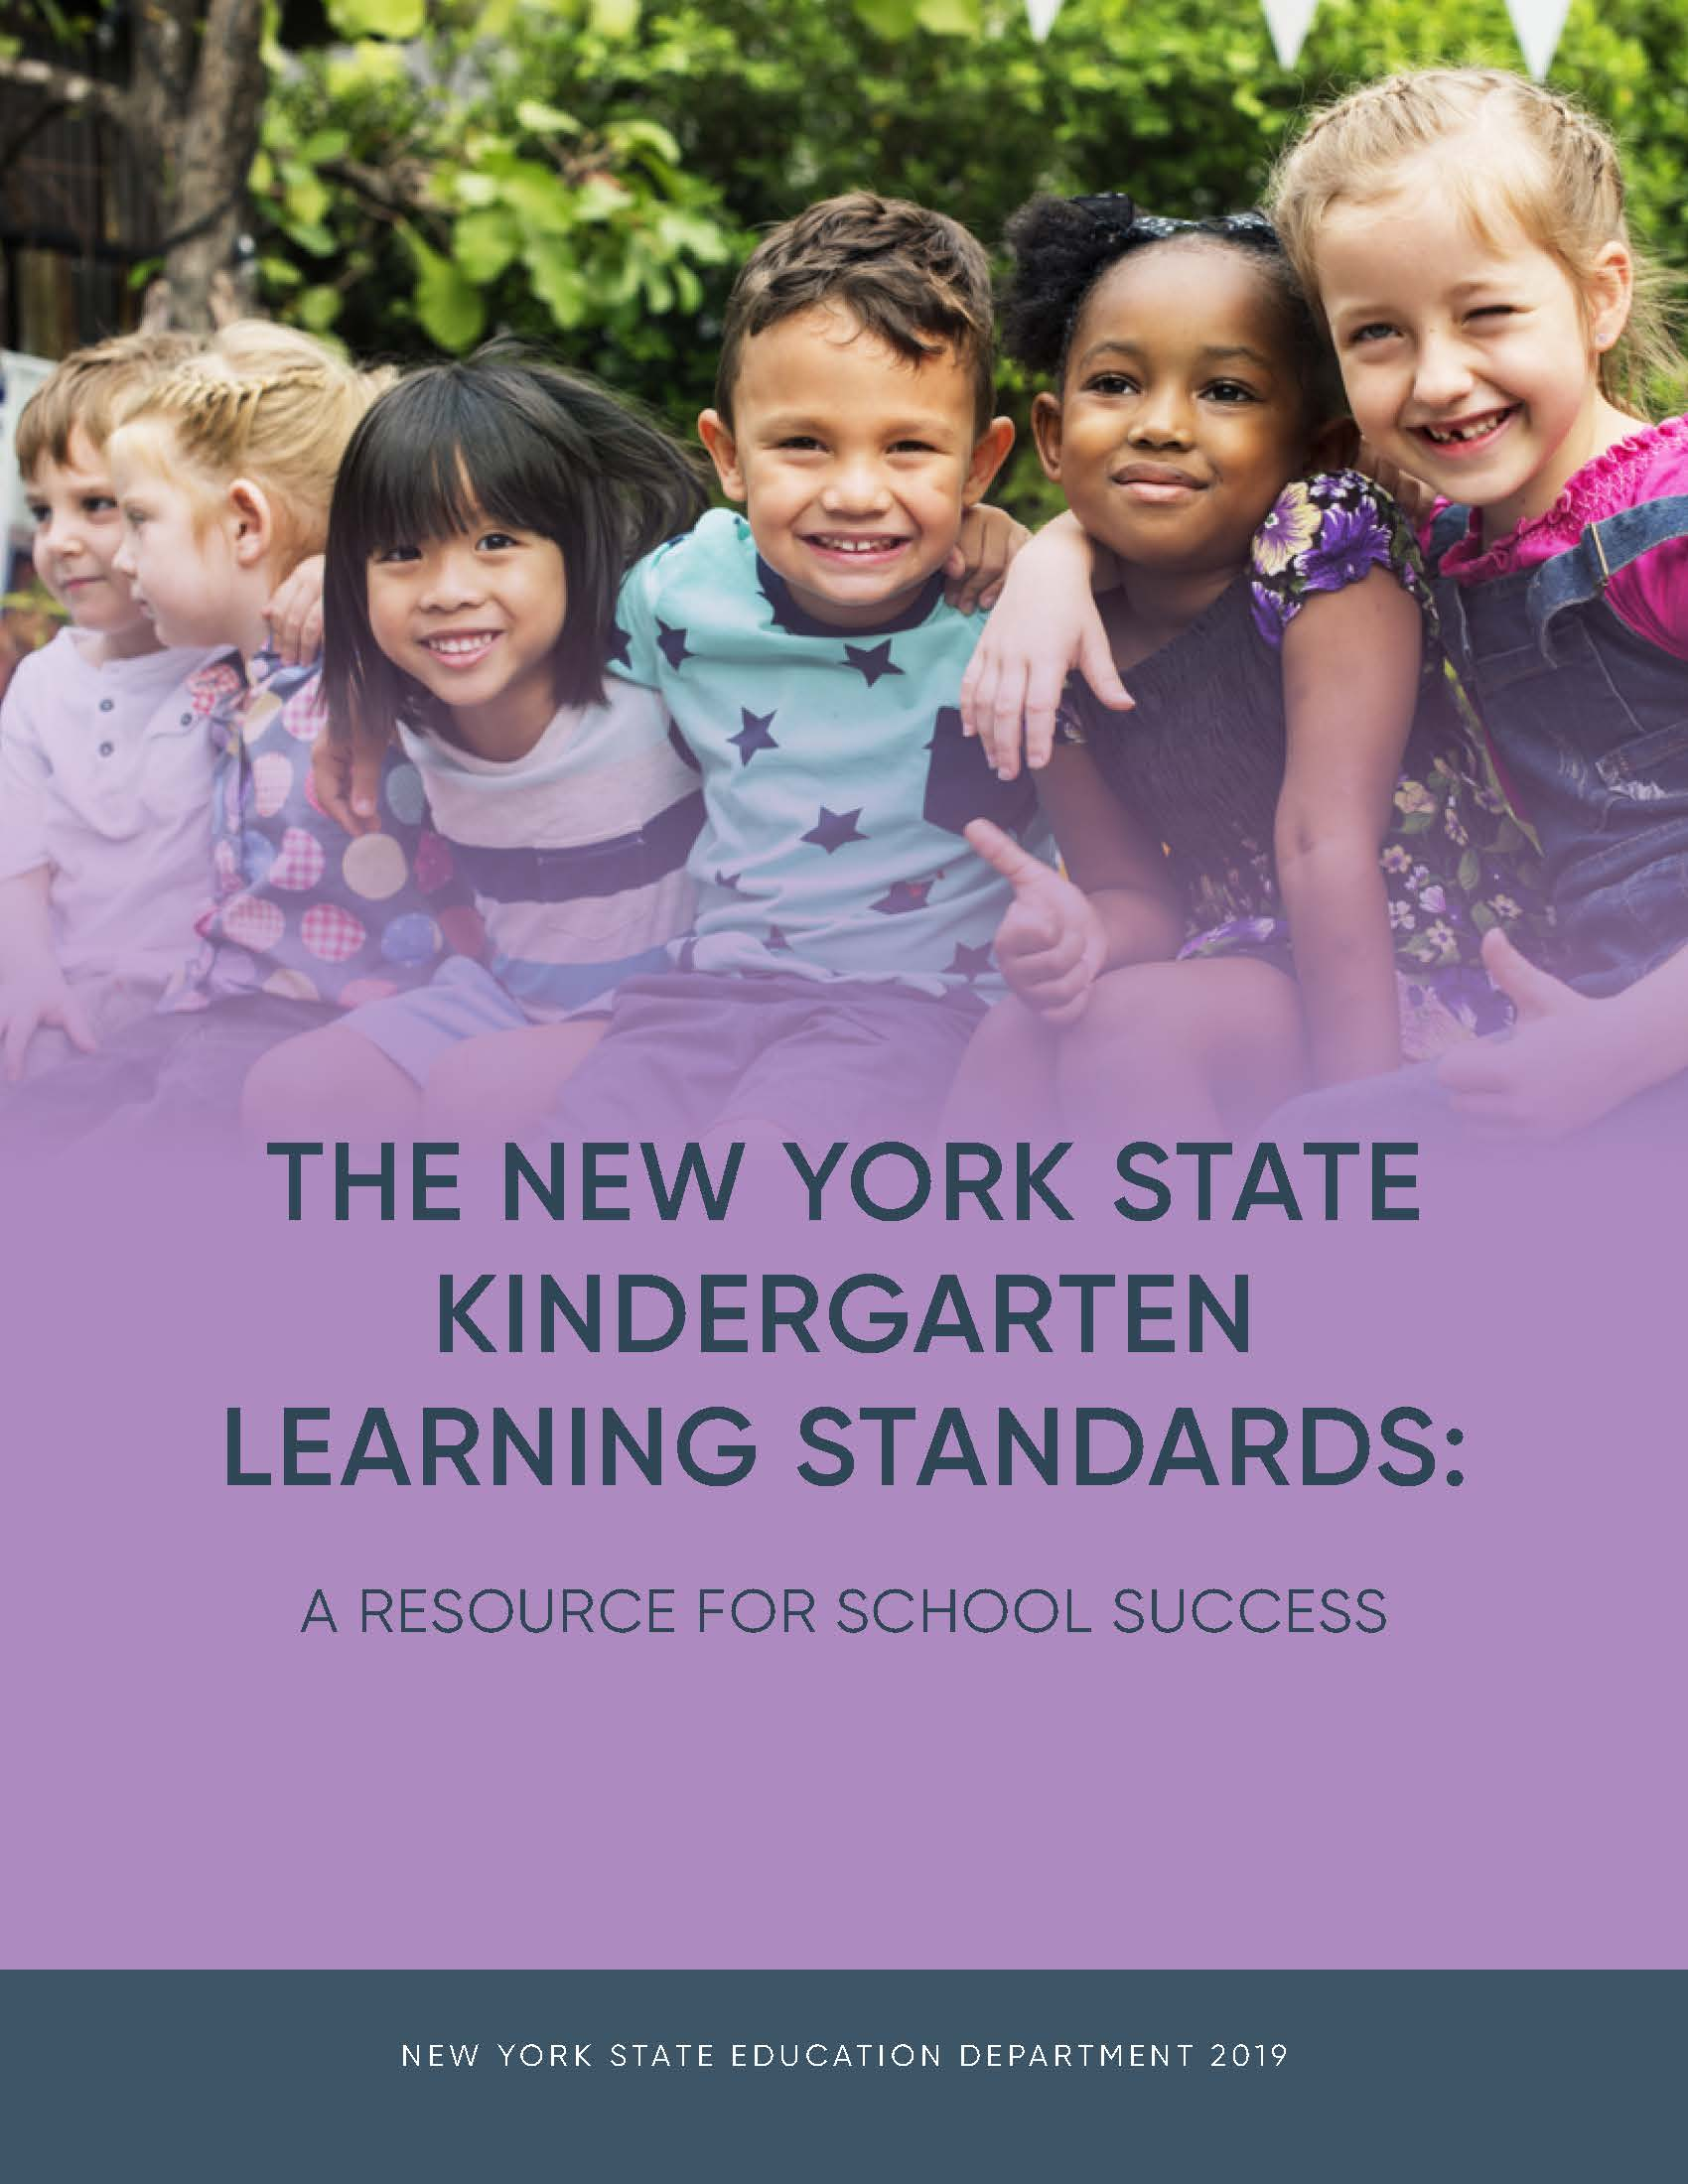 kindergarten learning standards